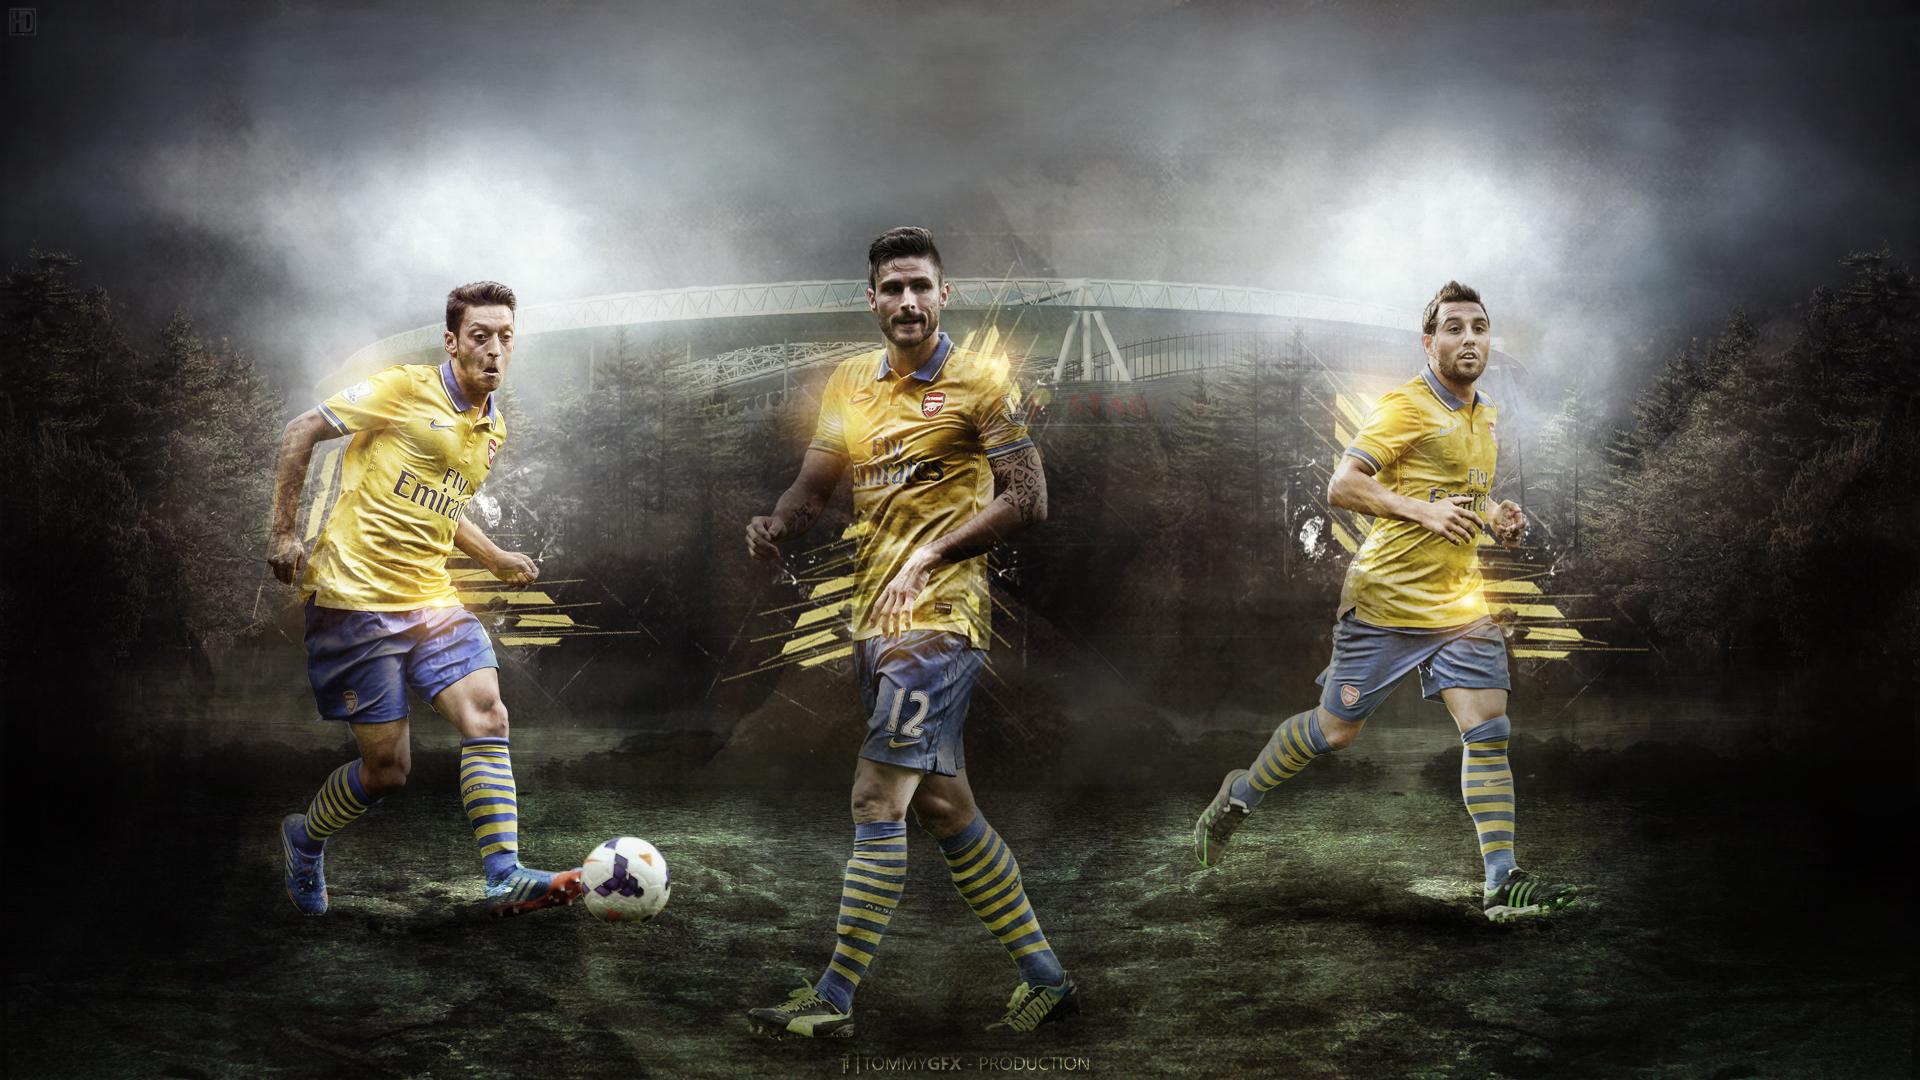 Arsenal Ozil Giroud Carzola Wallpaper HD 2014 1 Football Wallpaper 1920x1080